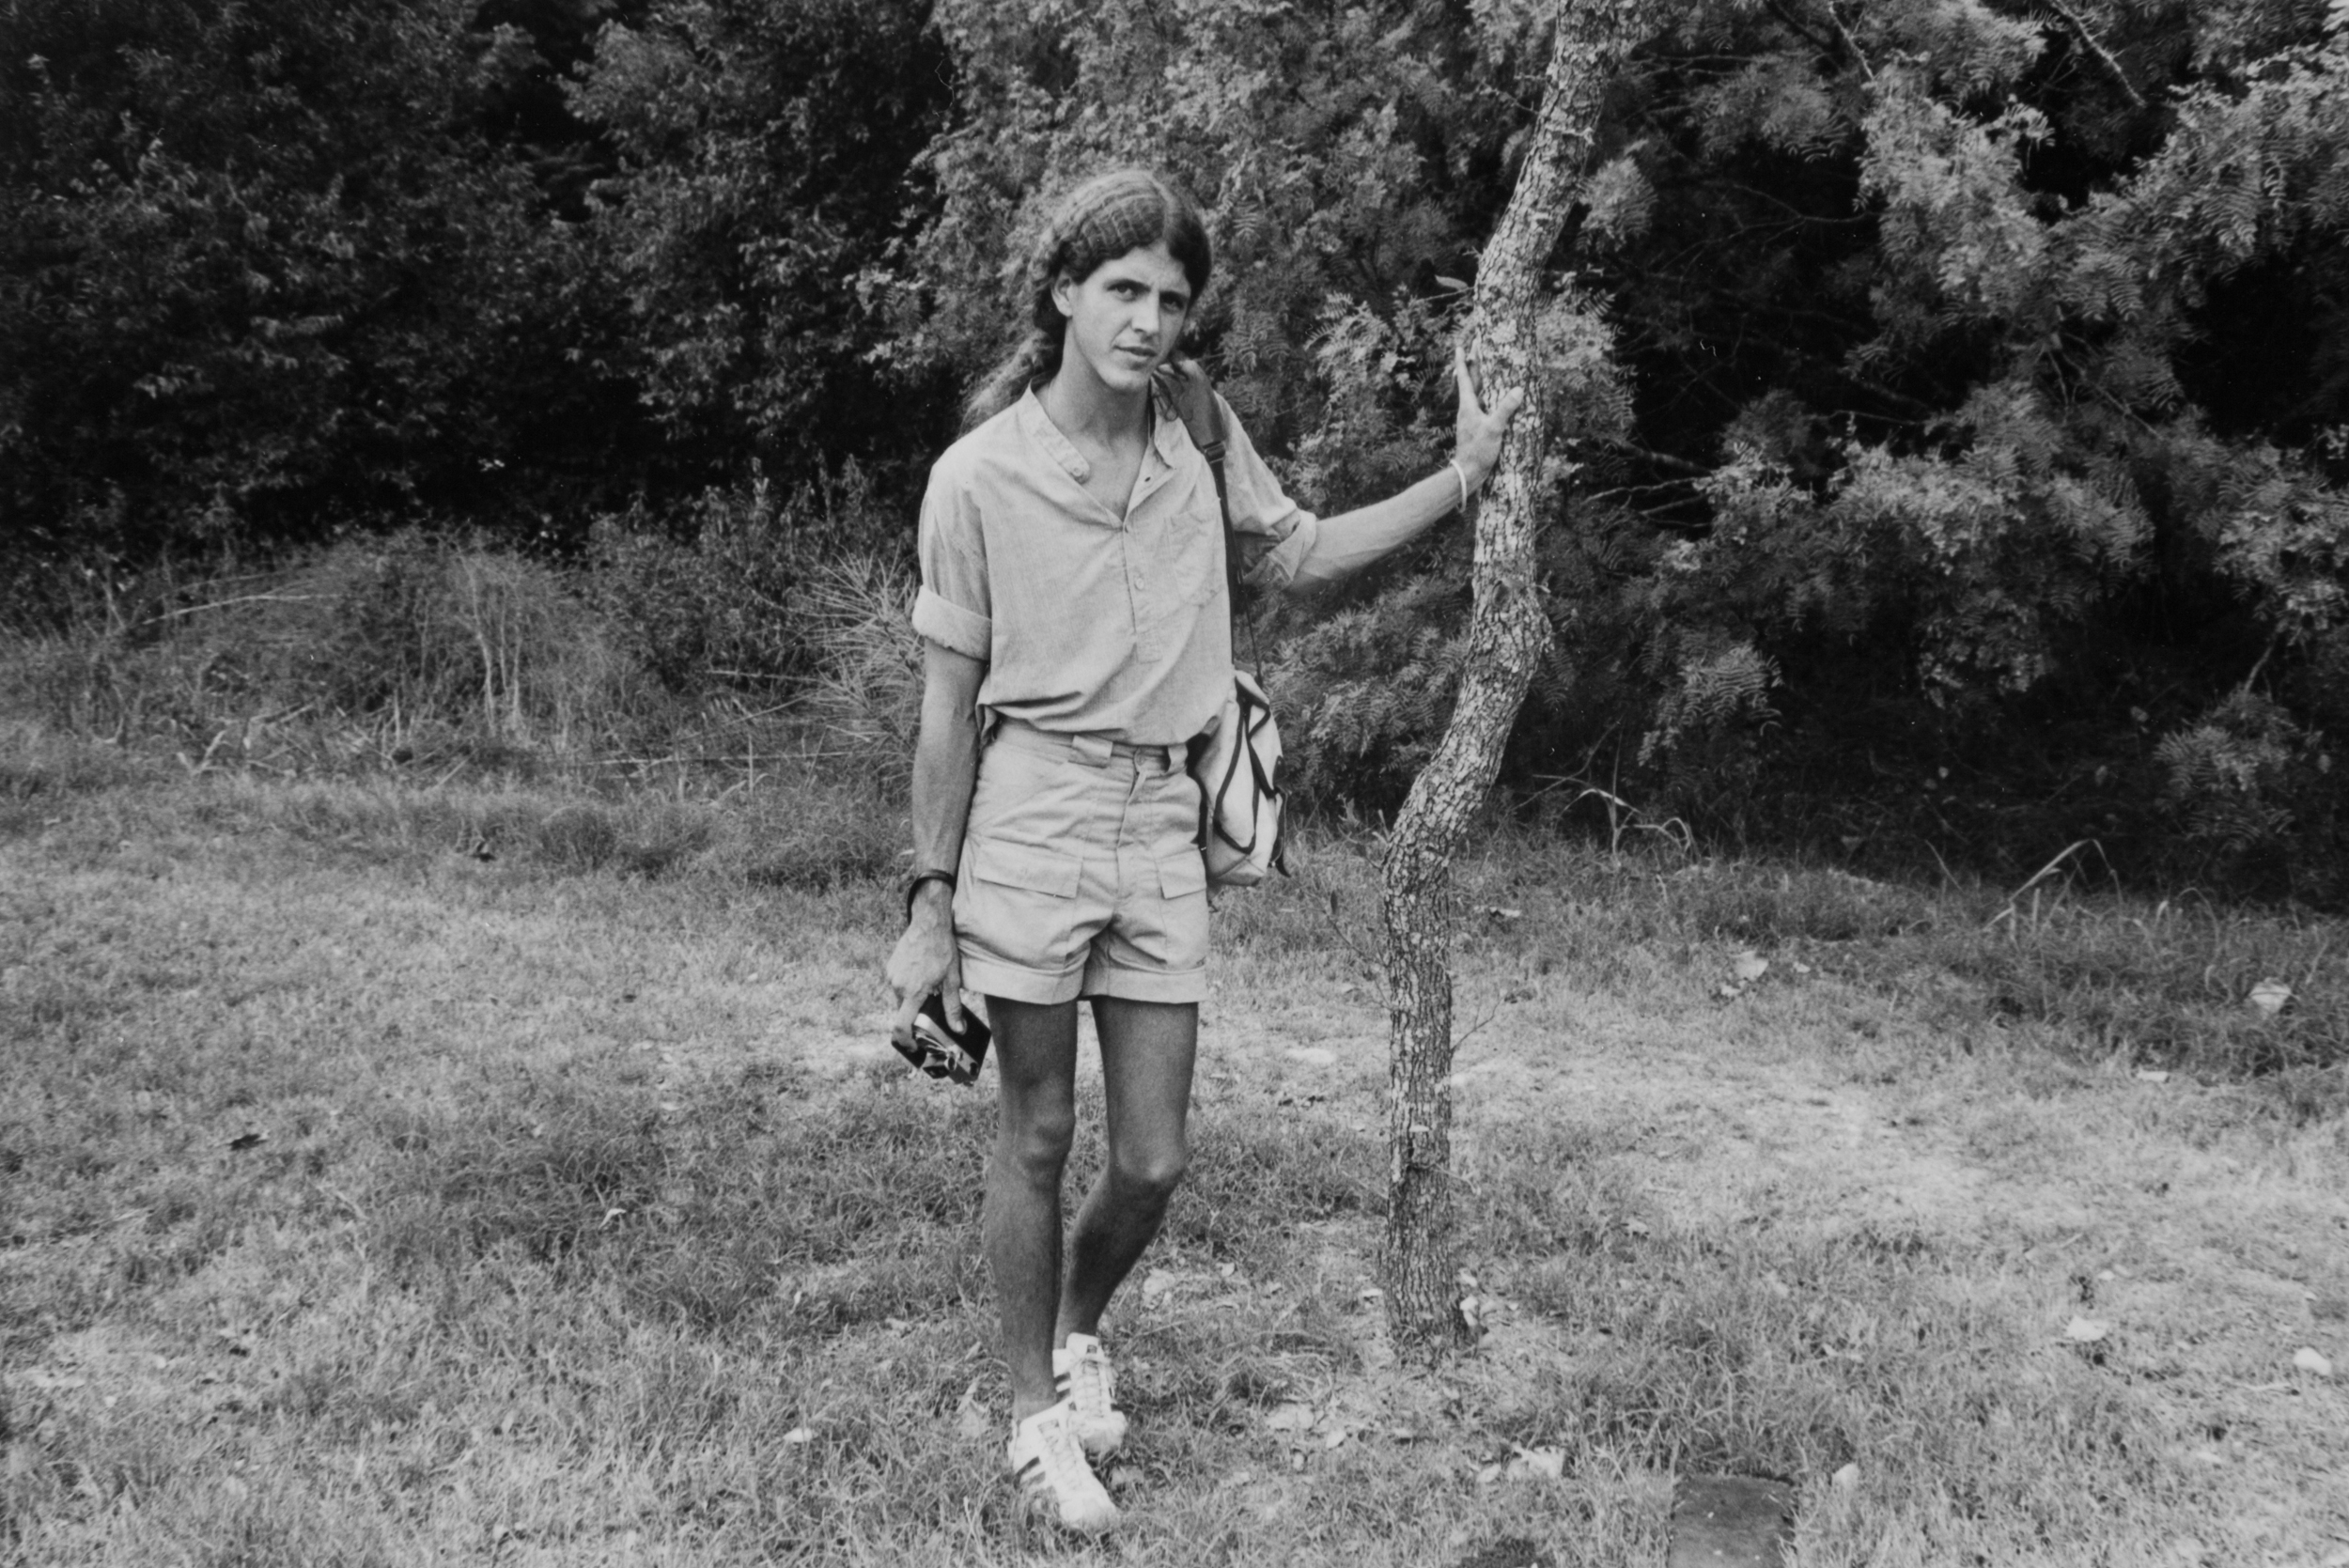 Brad Doherty, 1980